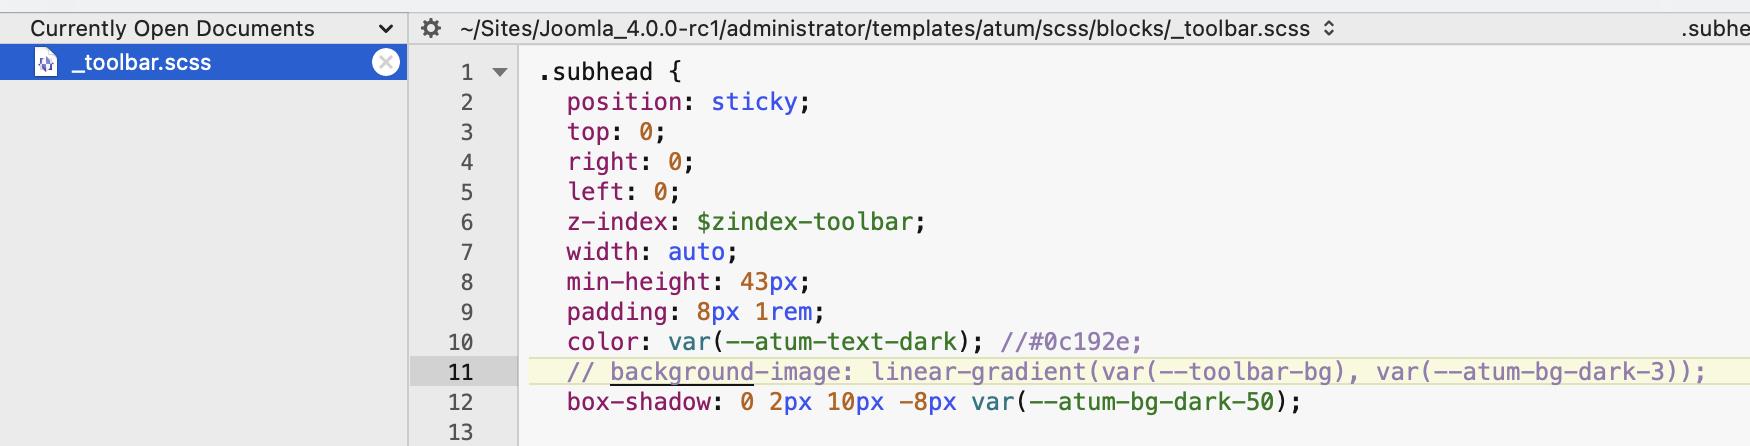 toolbar-scss-01.png